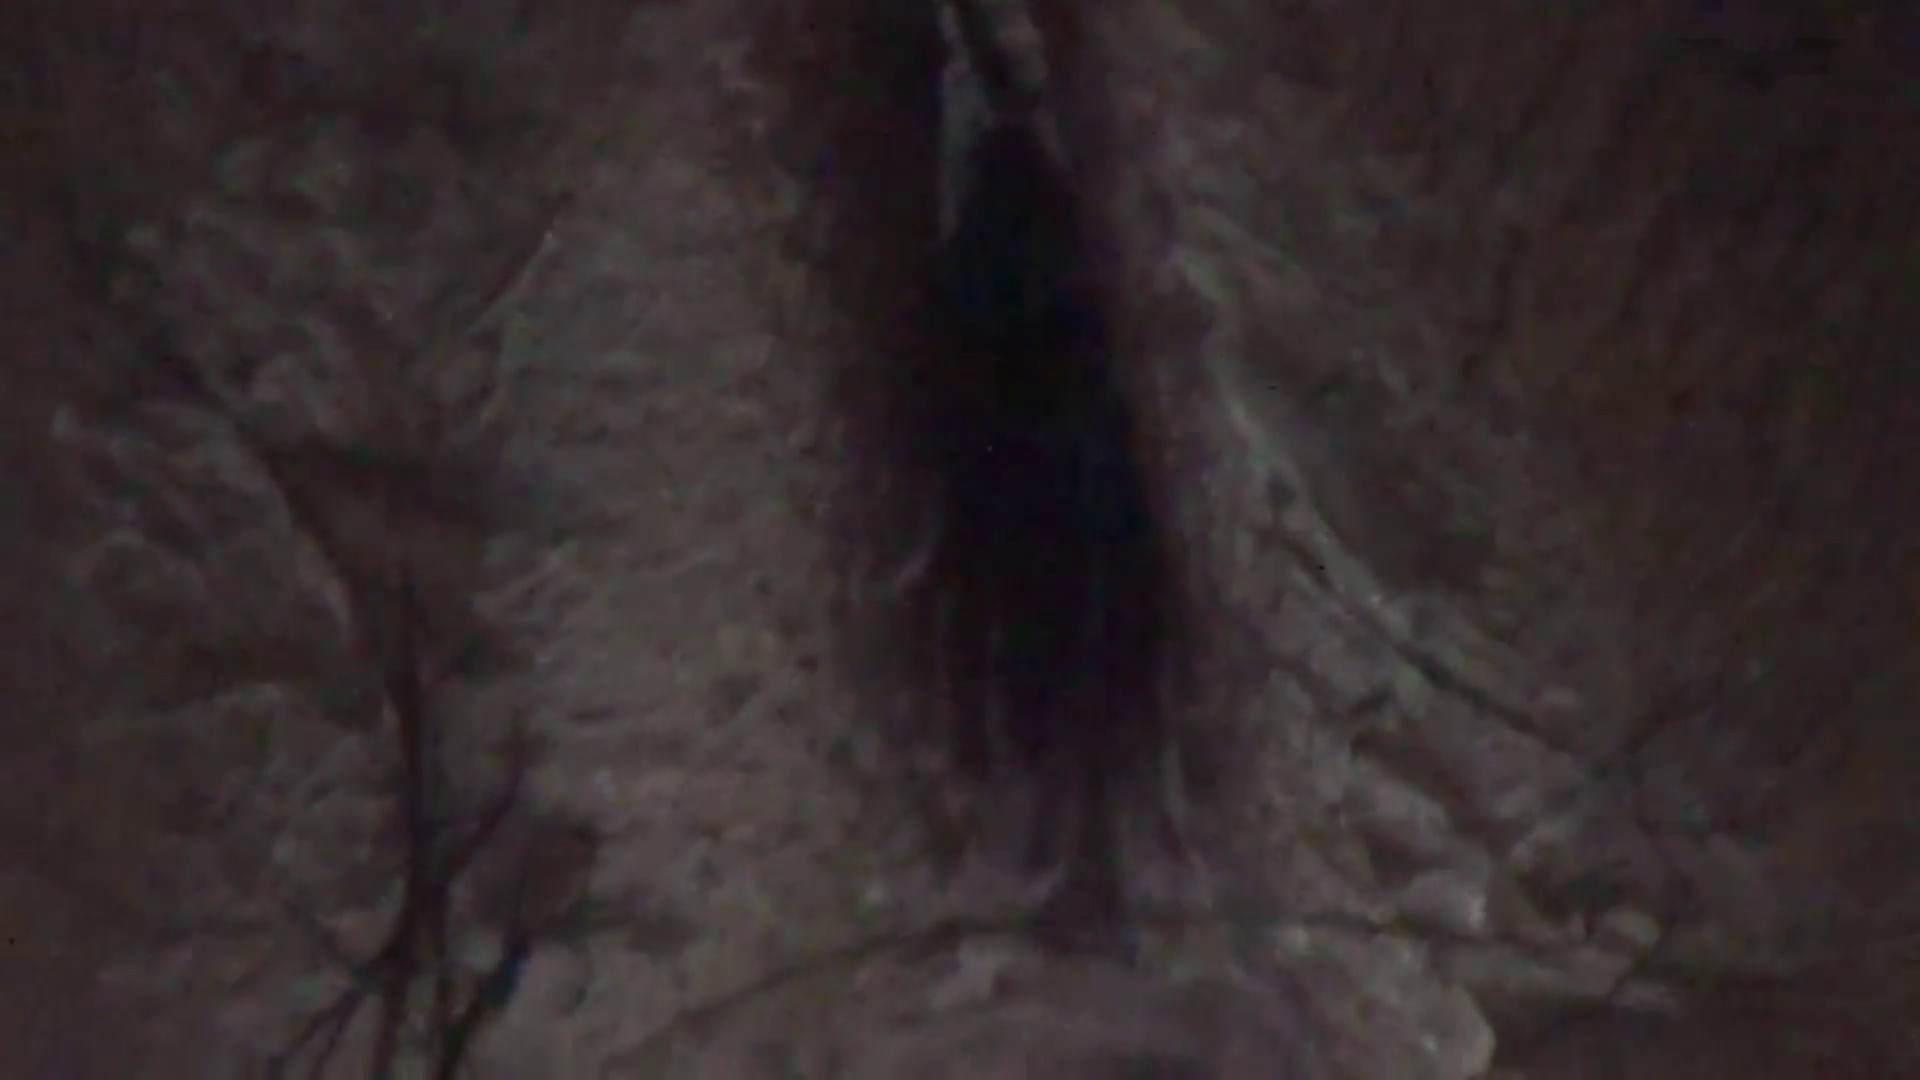 JD盗撮 美女の洗面所の秘密 Vol.44 OLの実態 盗み撮り動画キャプチャ 98pic 37